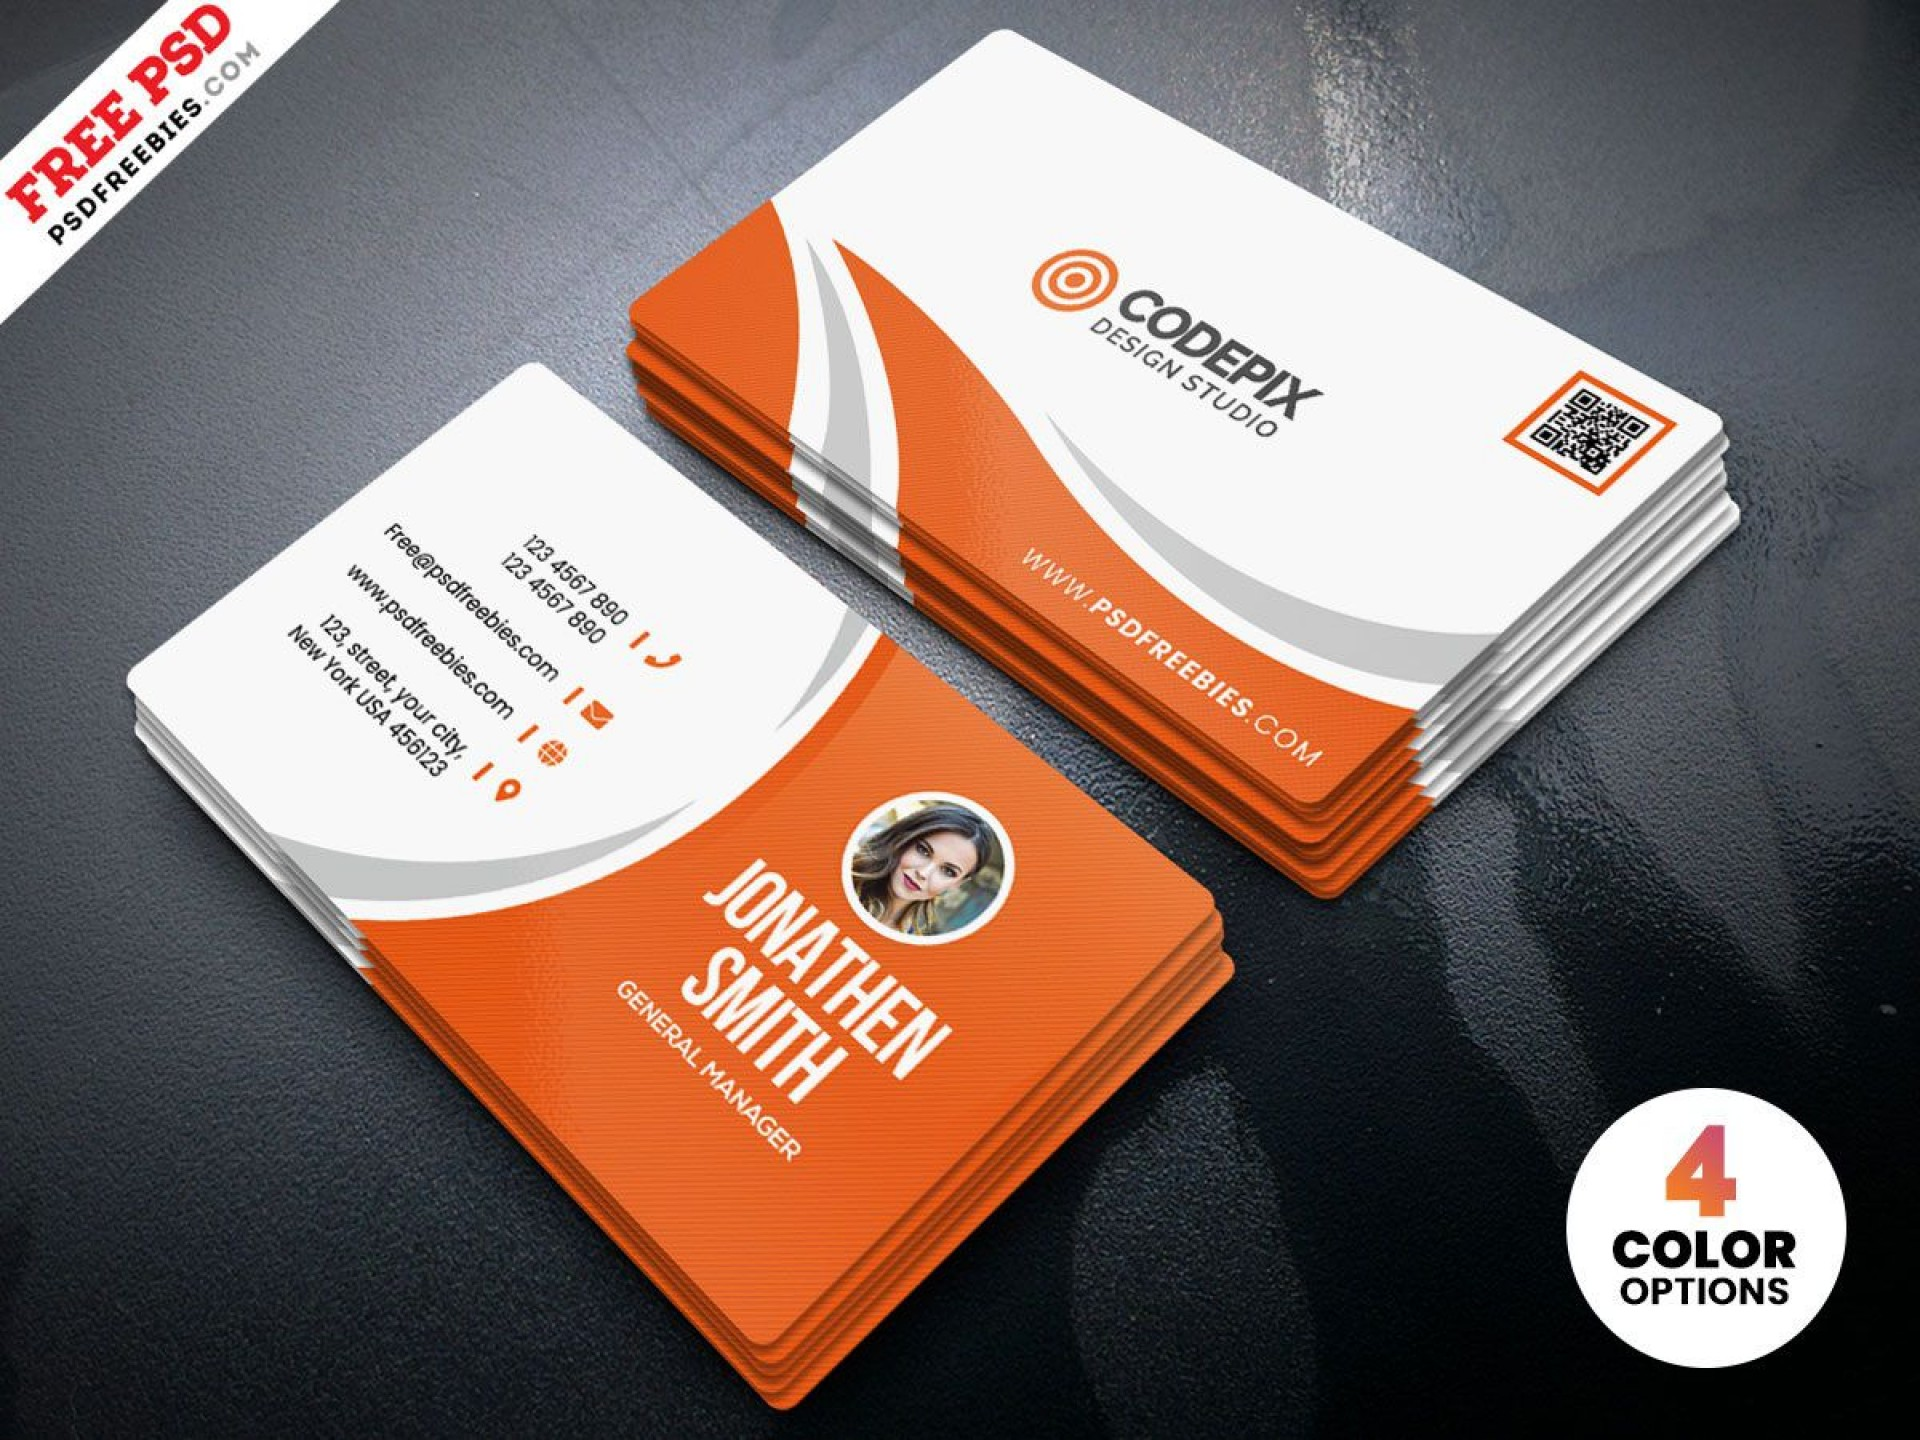 009 Impressive Simple Visiting Card Design Concept  Busines Idea Psd File Free Download1920